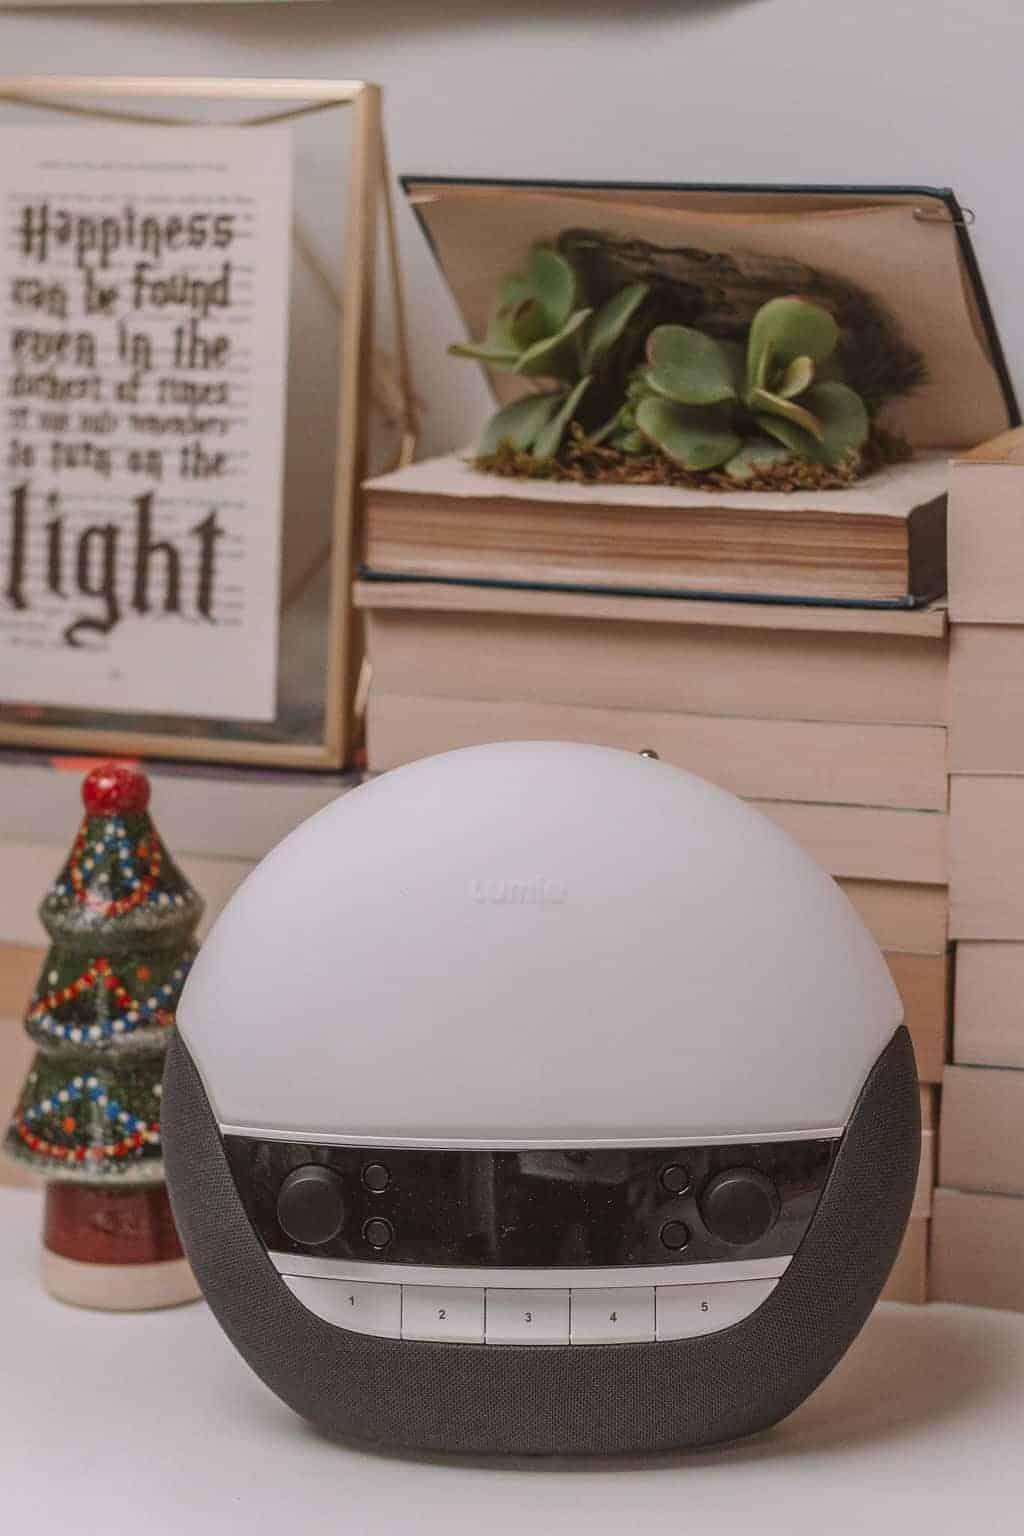 Bodyclock - Christmas Gift Guide 2018: Brilliant Christmas Gift Ideas For Her #whatshotblog